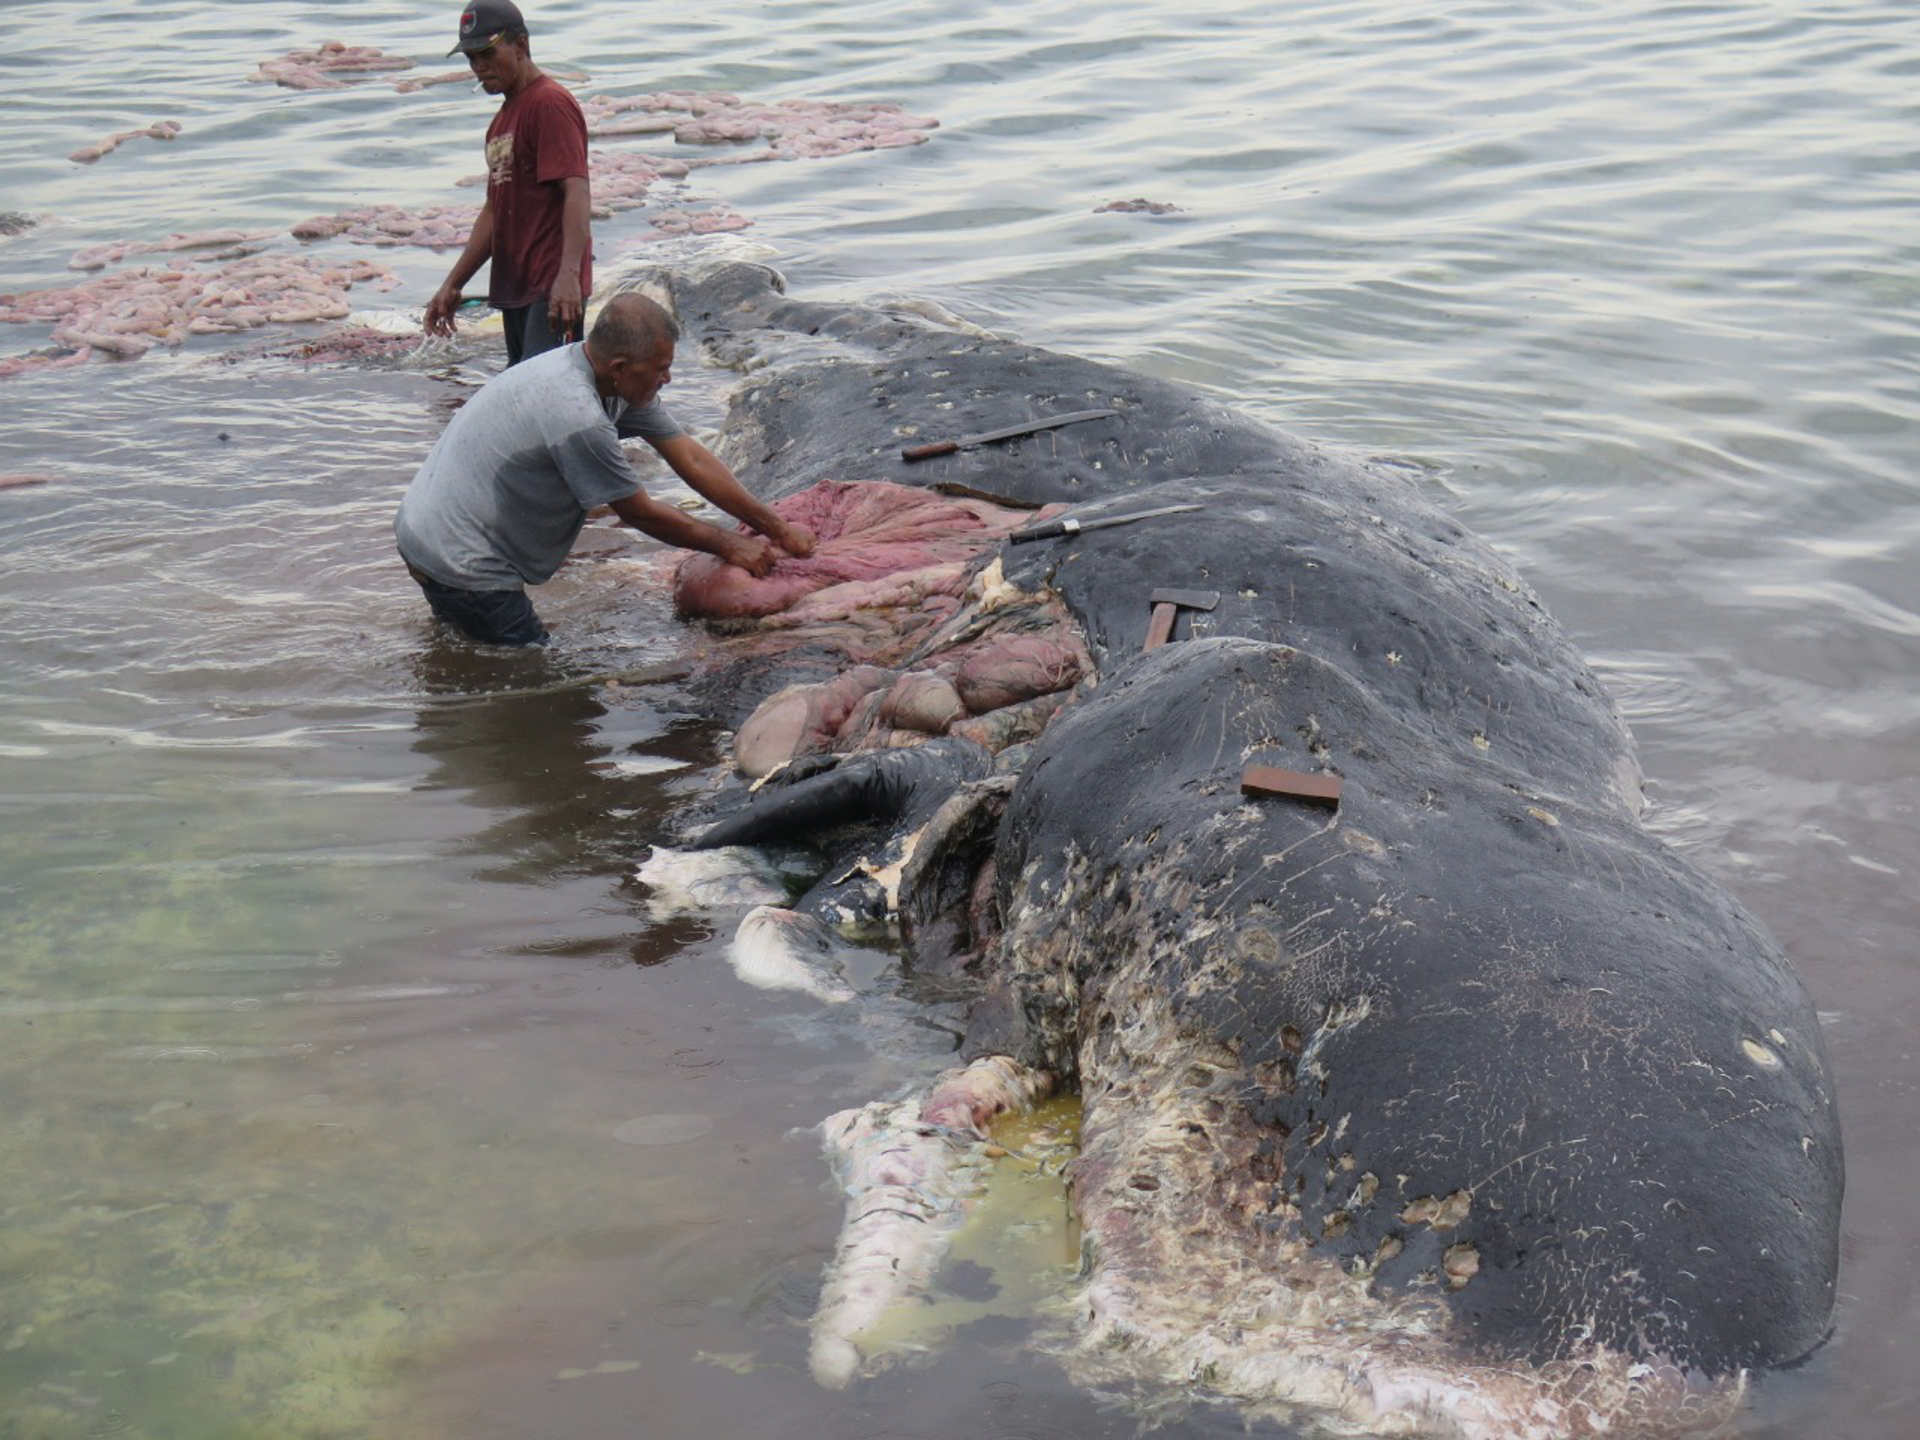 Wal Plastikmüll : Gestrandeter Wal mit über 1000 Teilen Plastik im Magen